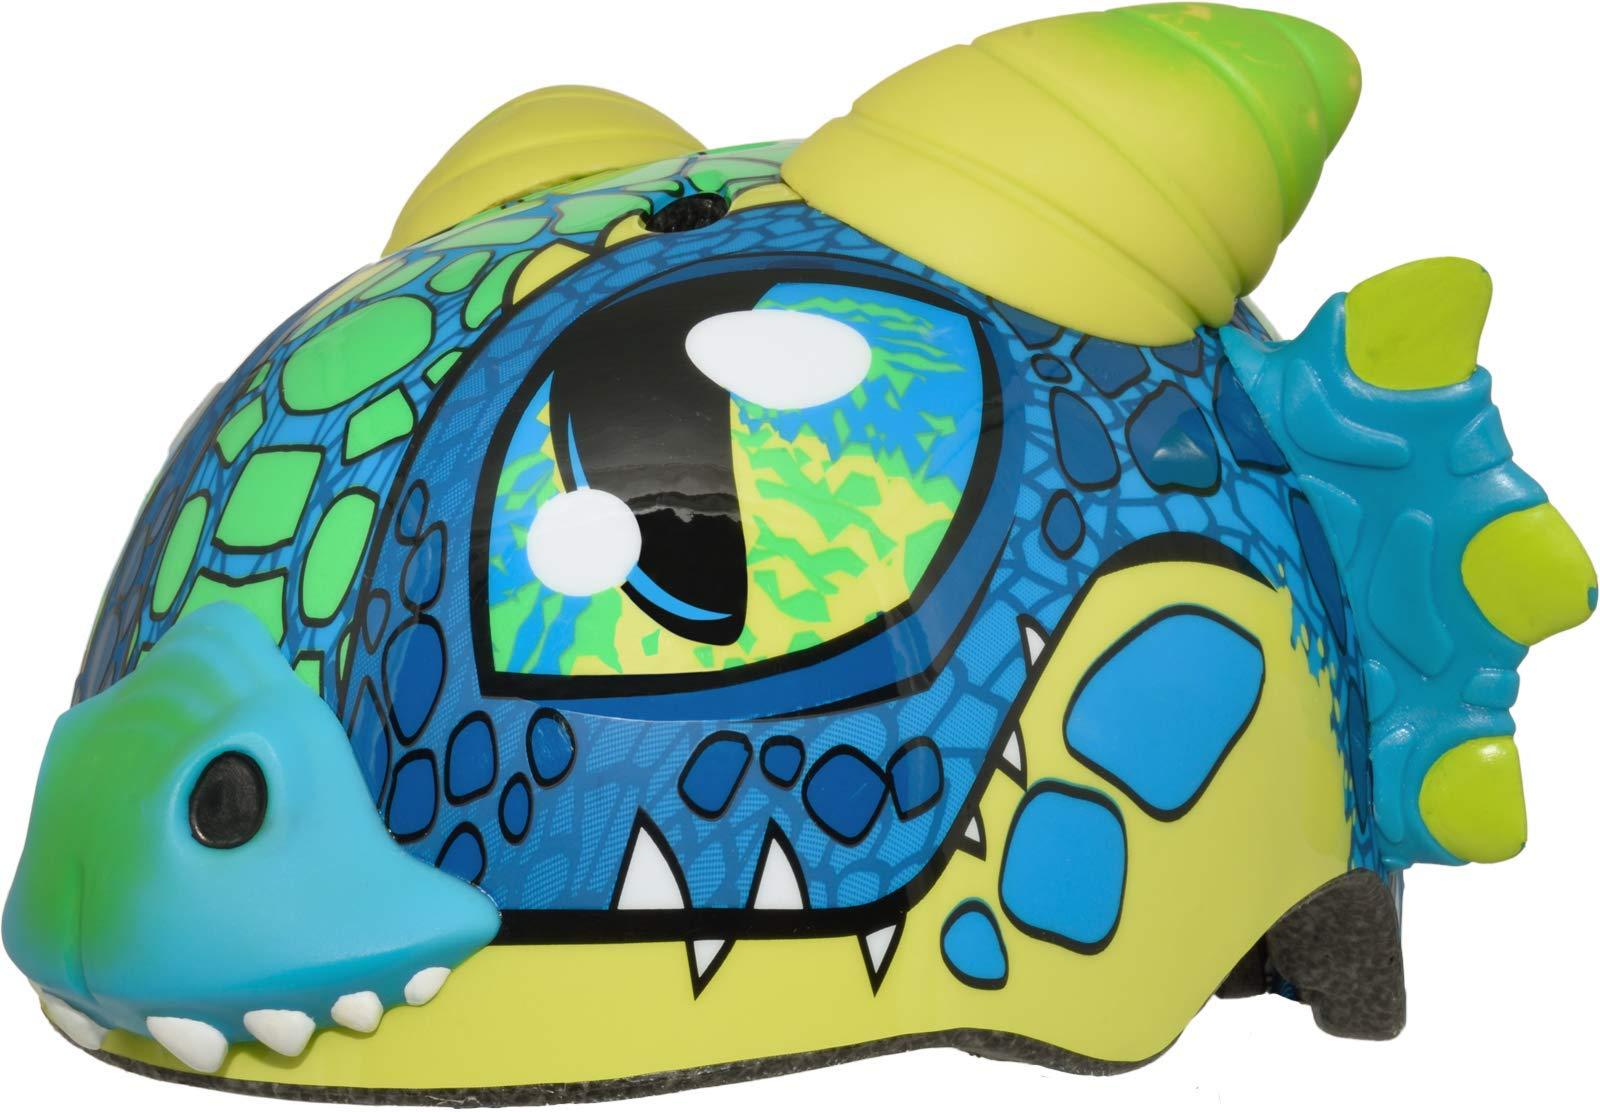 Raskullz 3D Characters Child and Toddler Bike Helmets